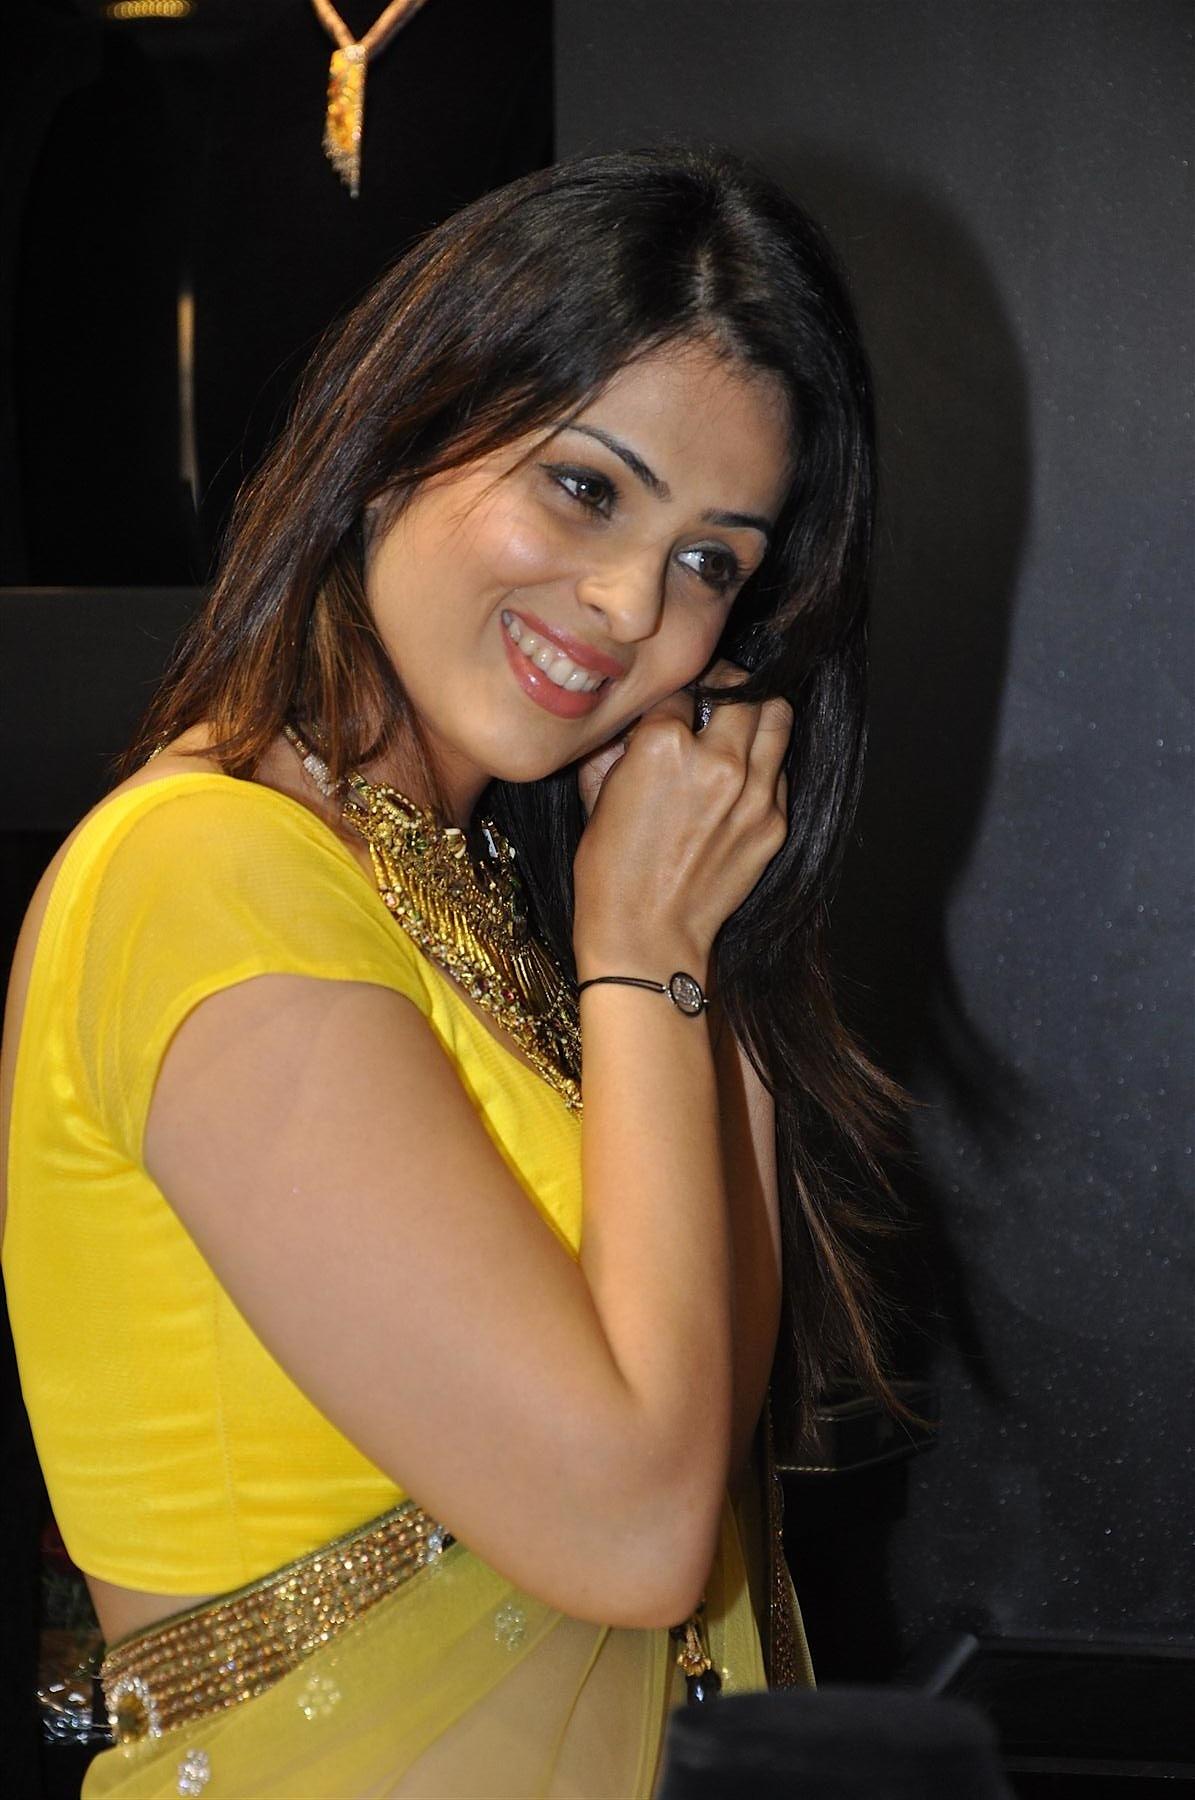 Anjana Sukhani hot wallpapers in bikini